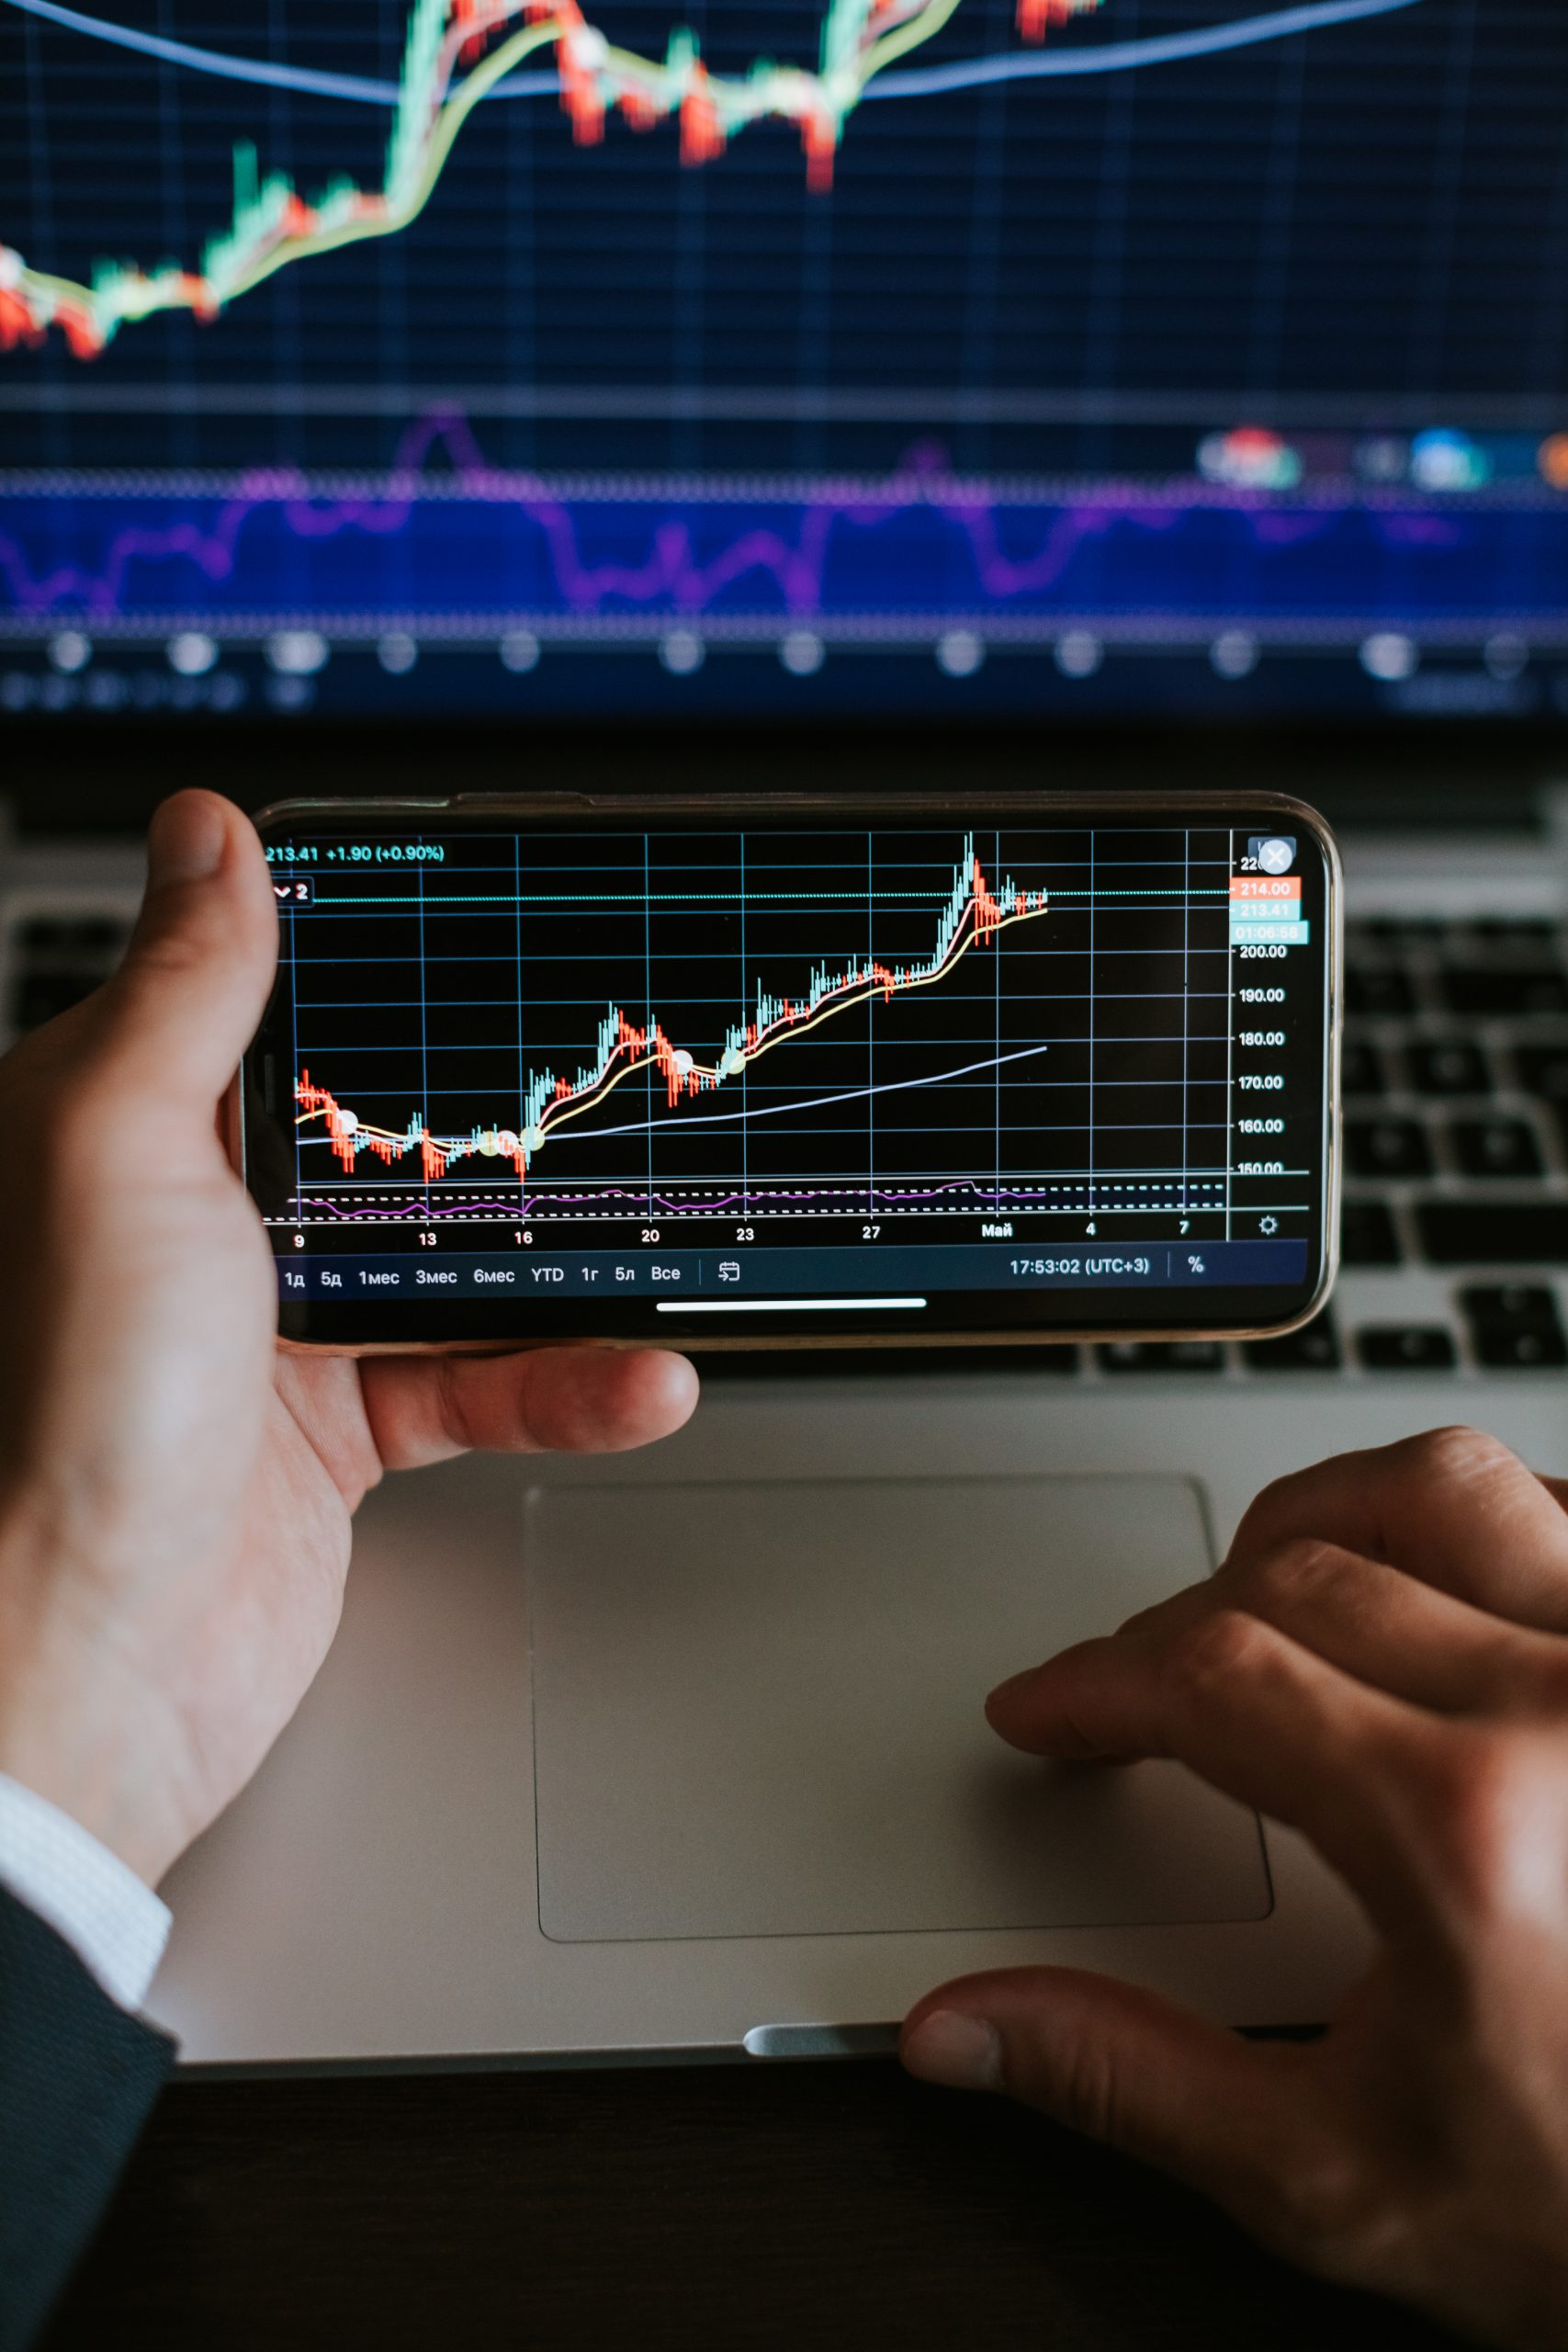 stockbroker profit analysis on trade graph with candlesticks